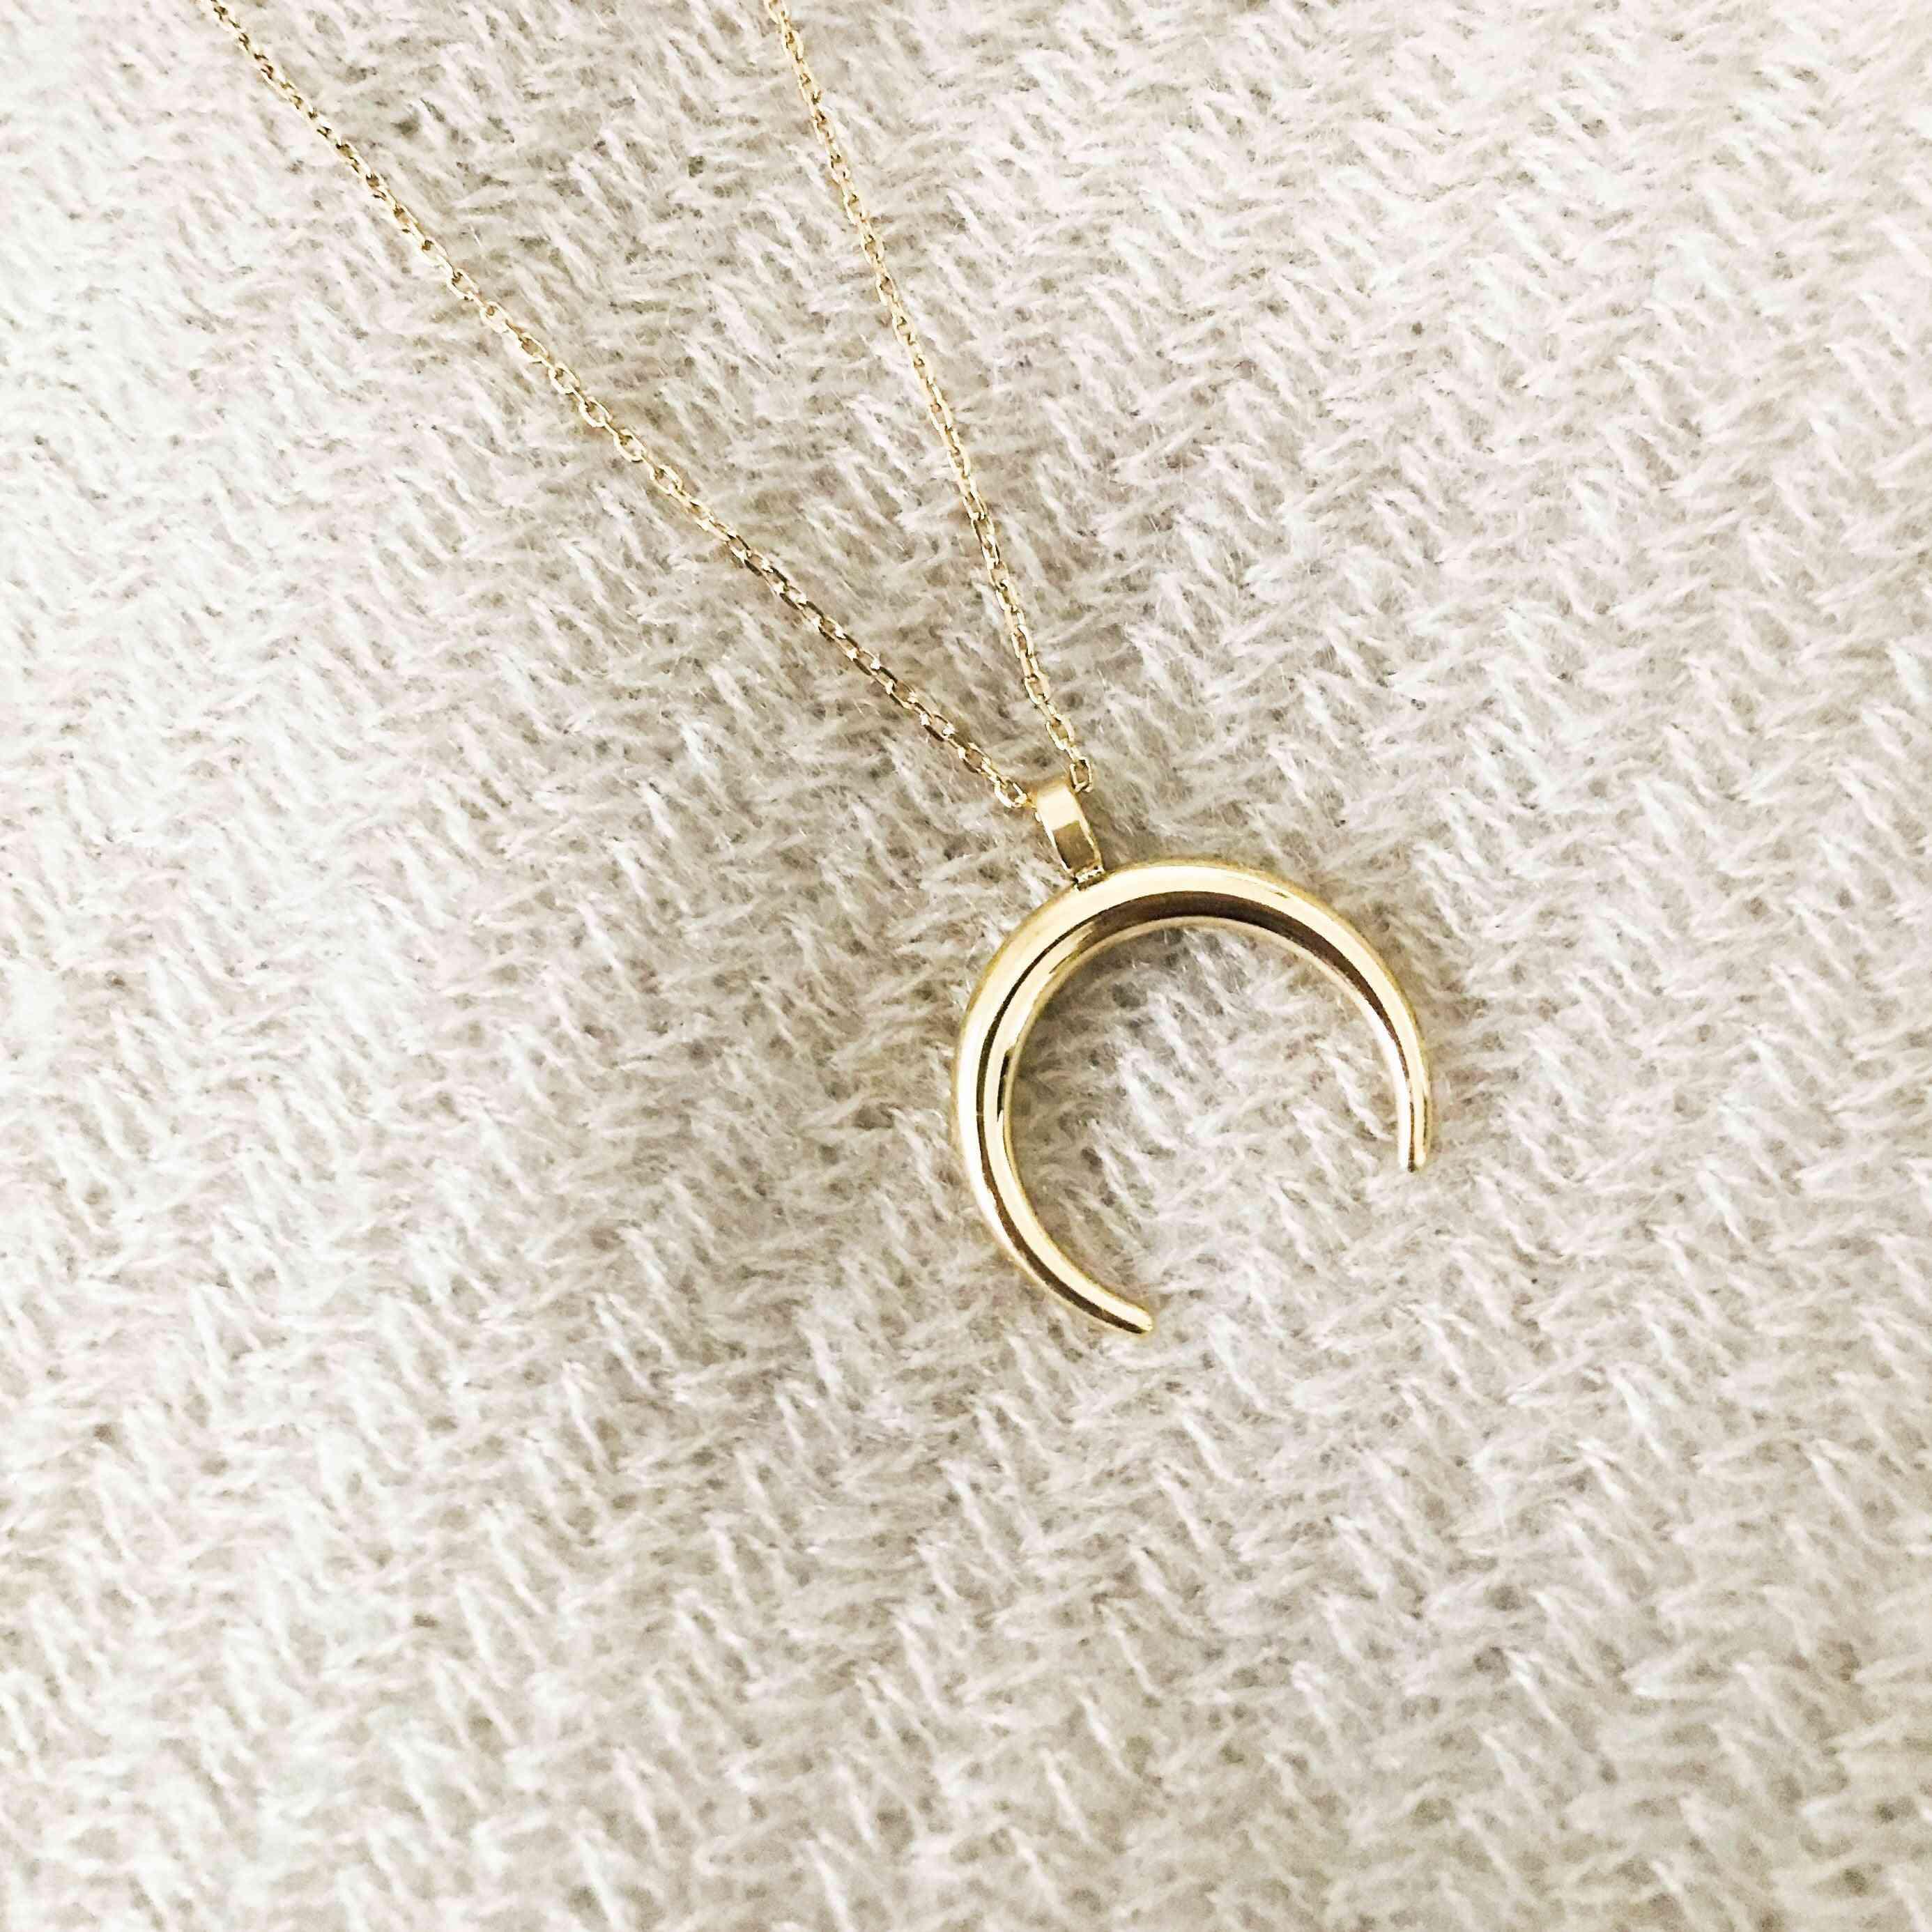 Gold Half Moon Design Pendant